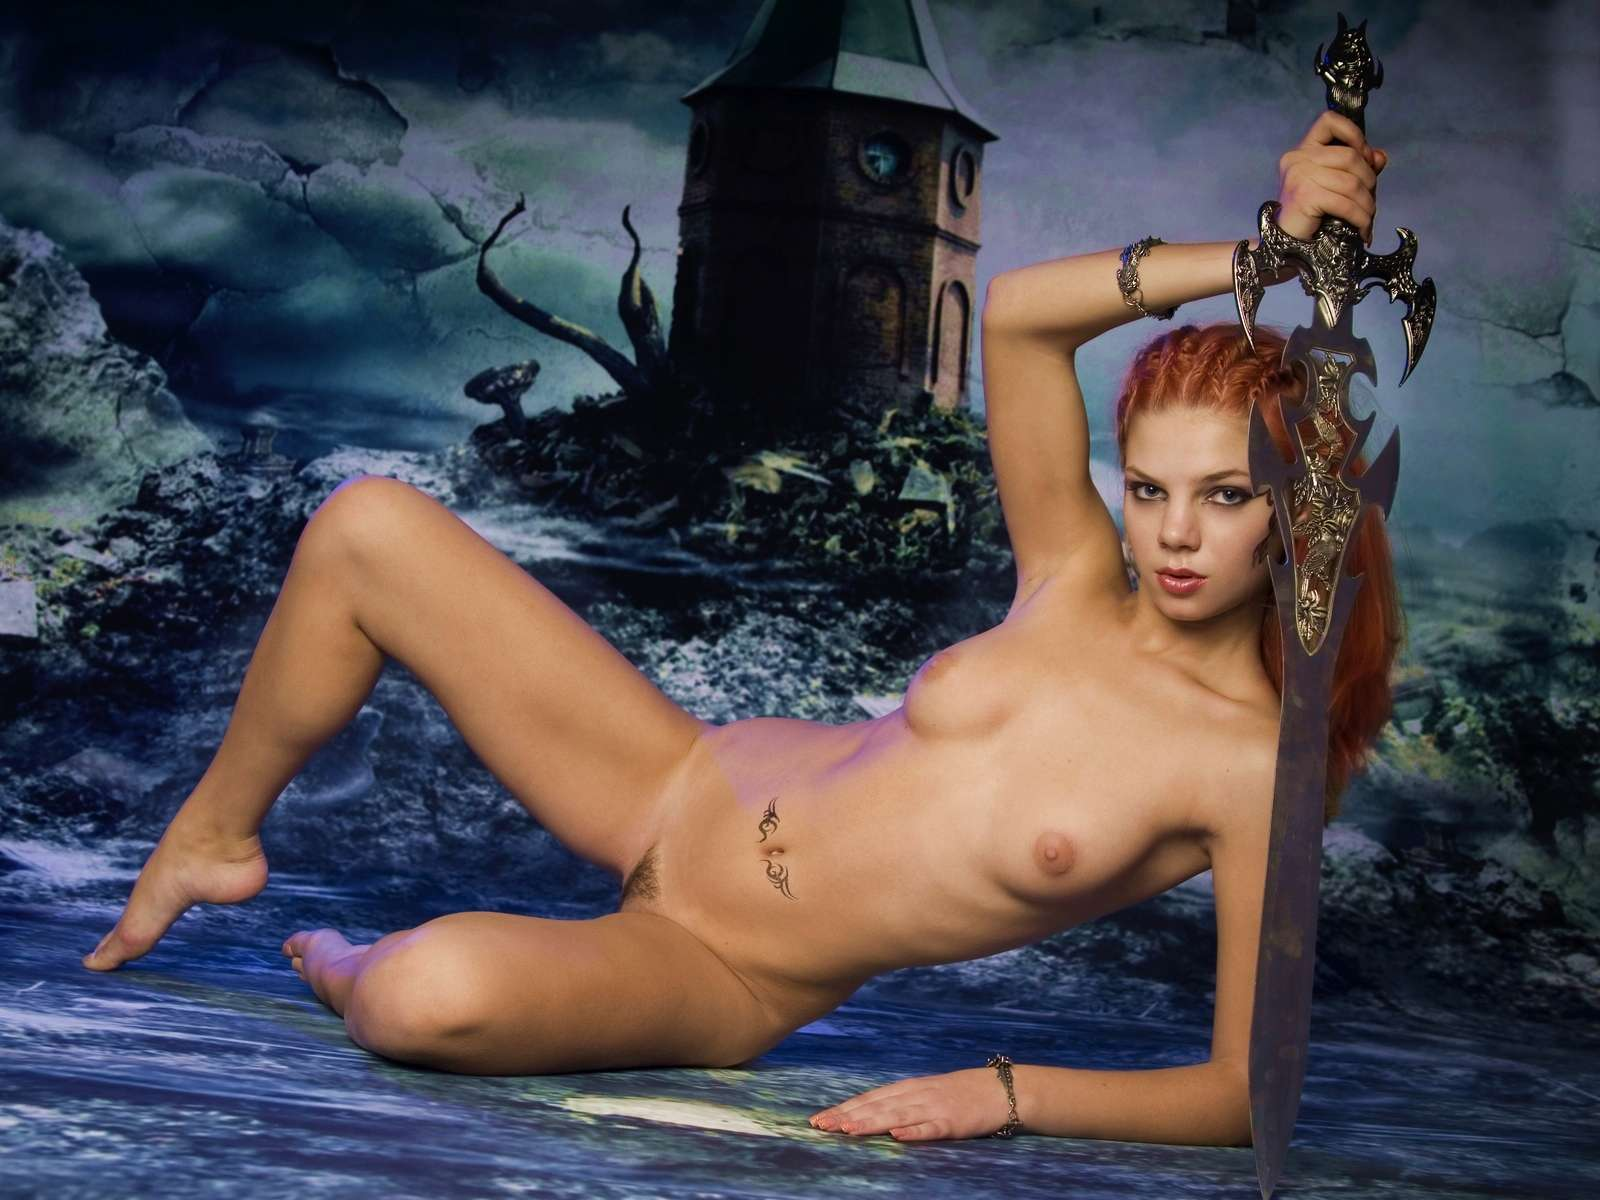 Nude ass sexy hot